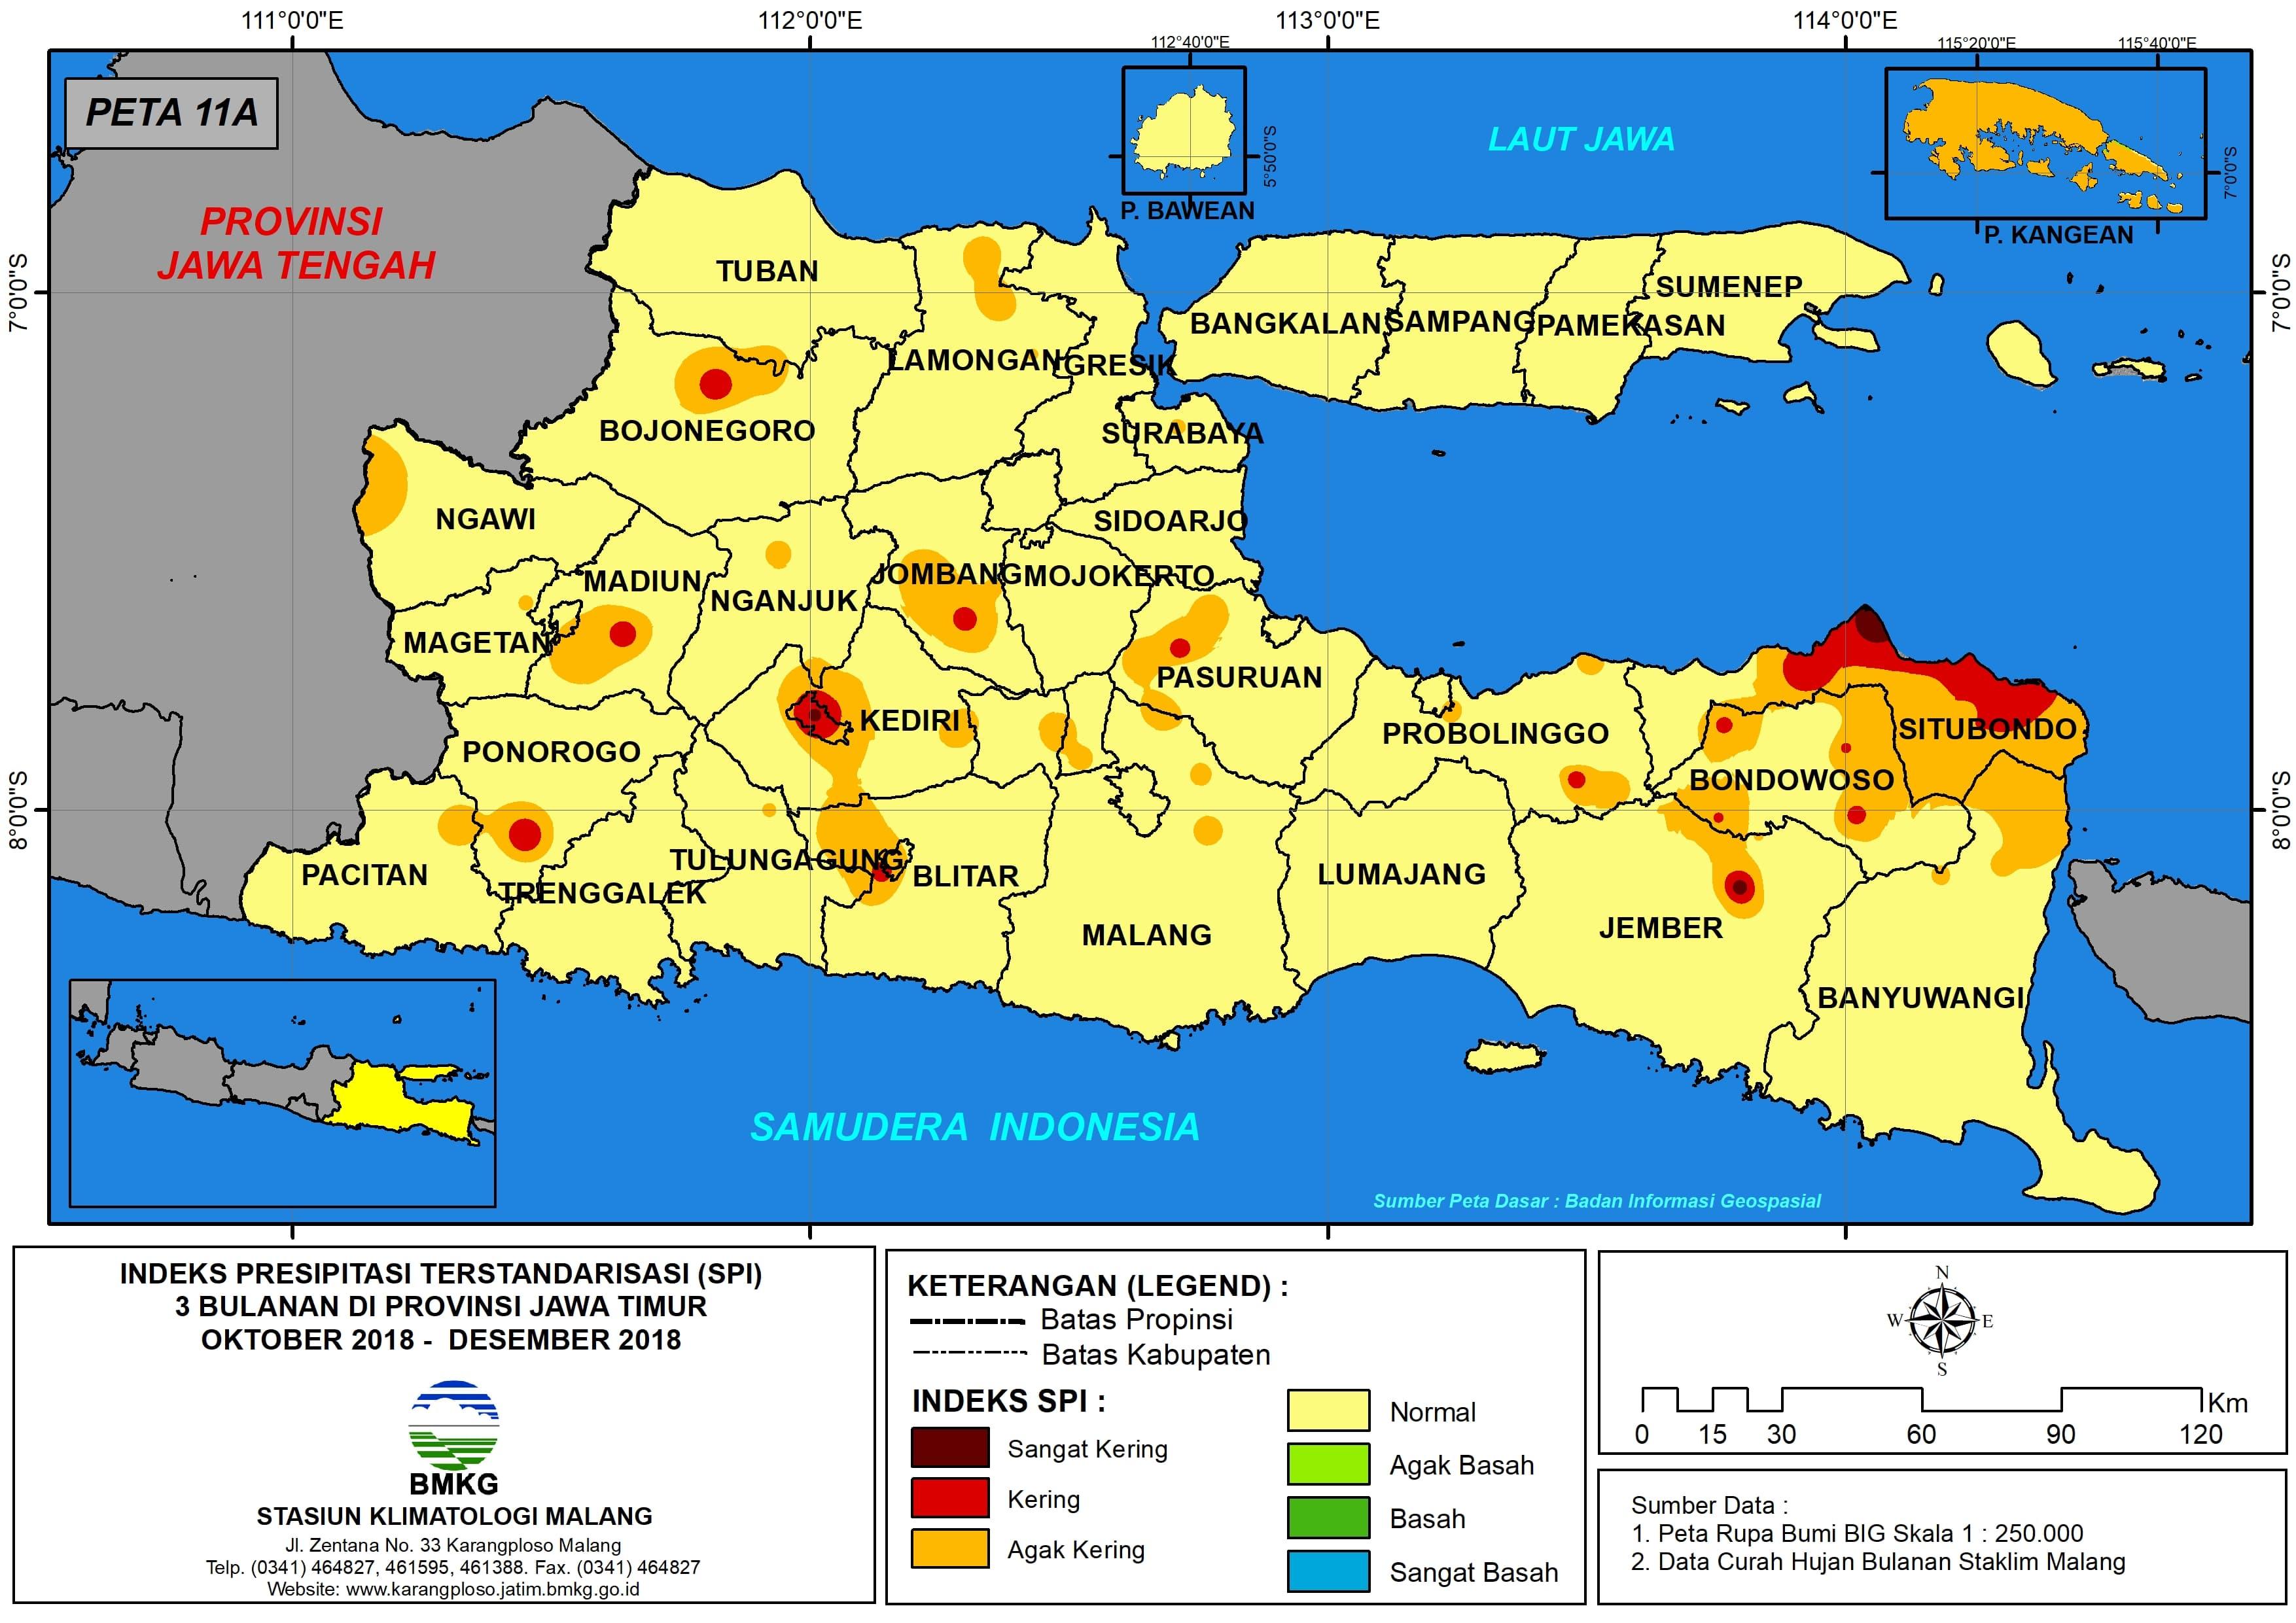 Analisis Indeks Presipitasi Terstandarisasi SPI 3 Bulanan Untuk Bulan Oktober Nopember Desember Tahun 2018 di Provinsi Jawa Timur